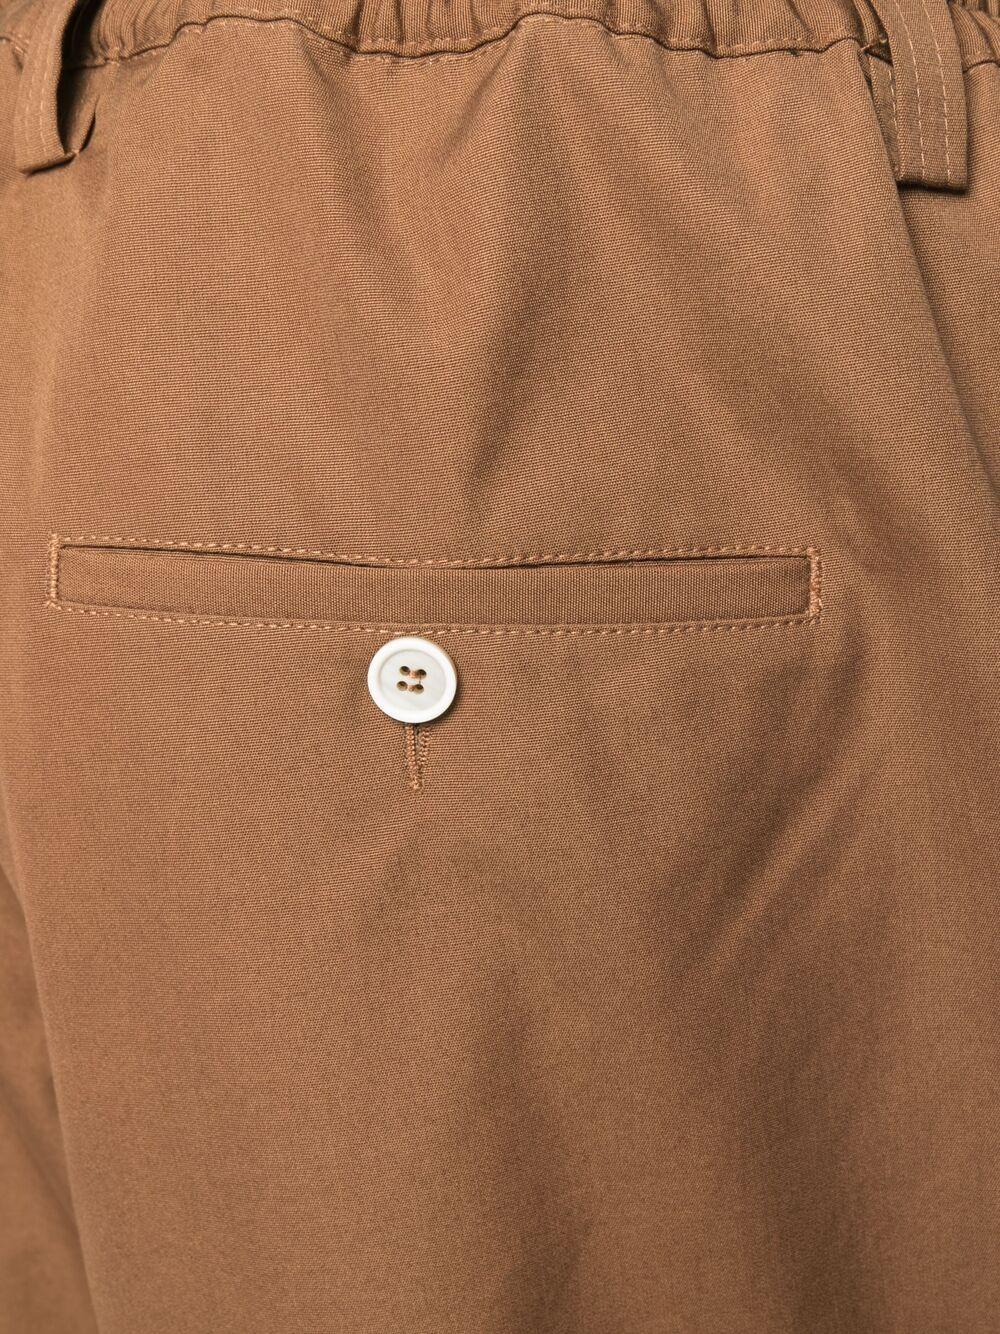 Marni straight leg trousers man brown MARNI | Trousers | PUMU0017A0 S5385200M28